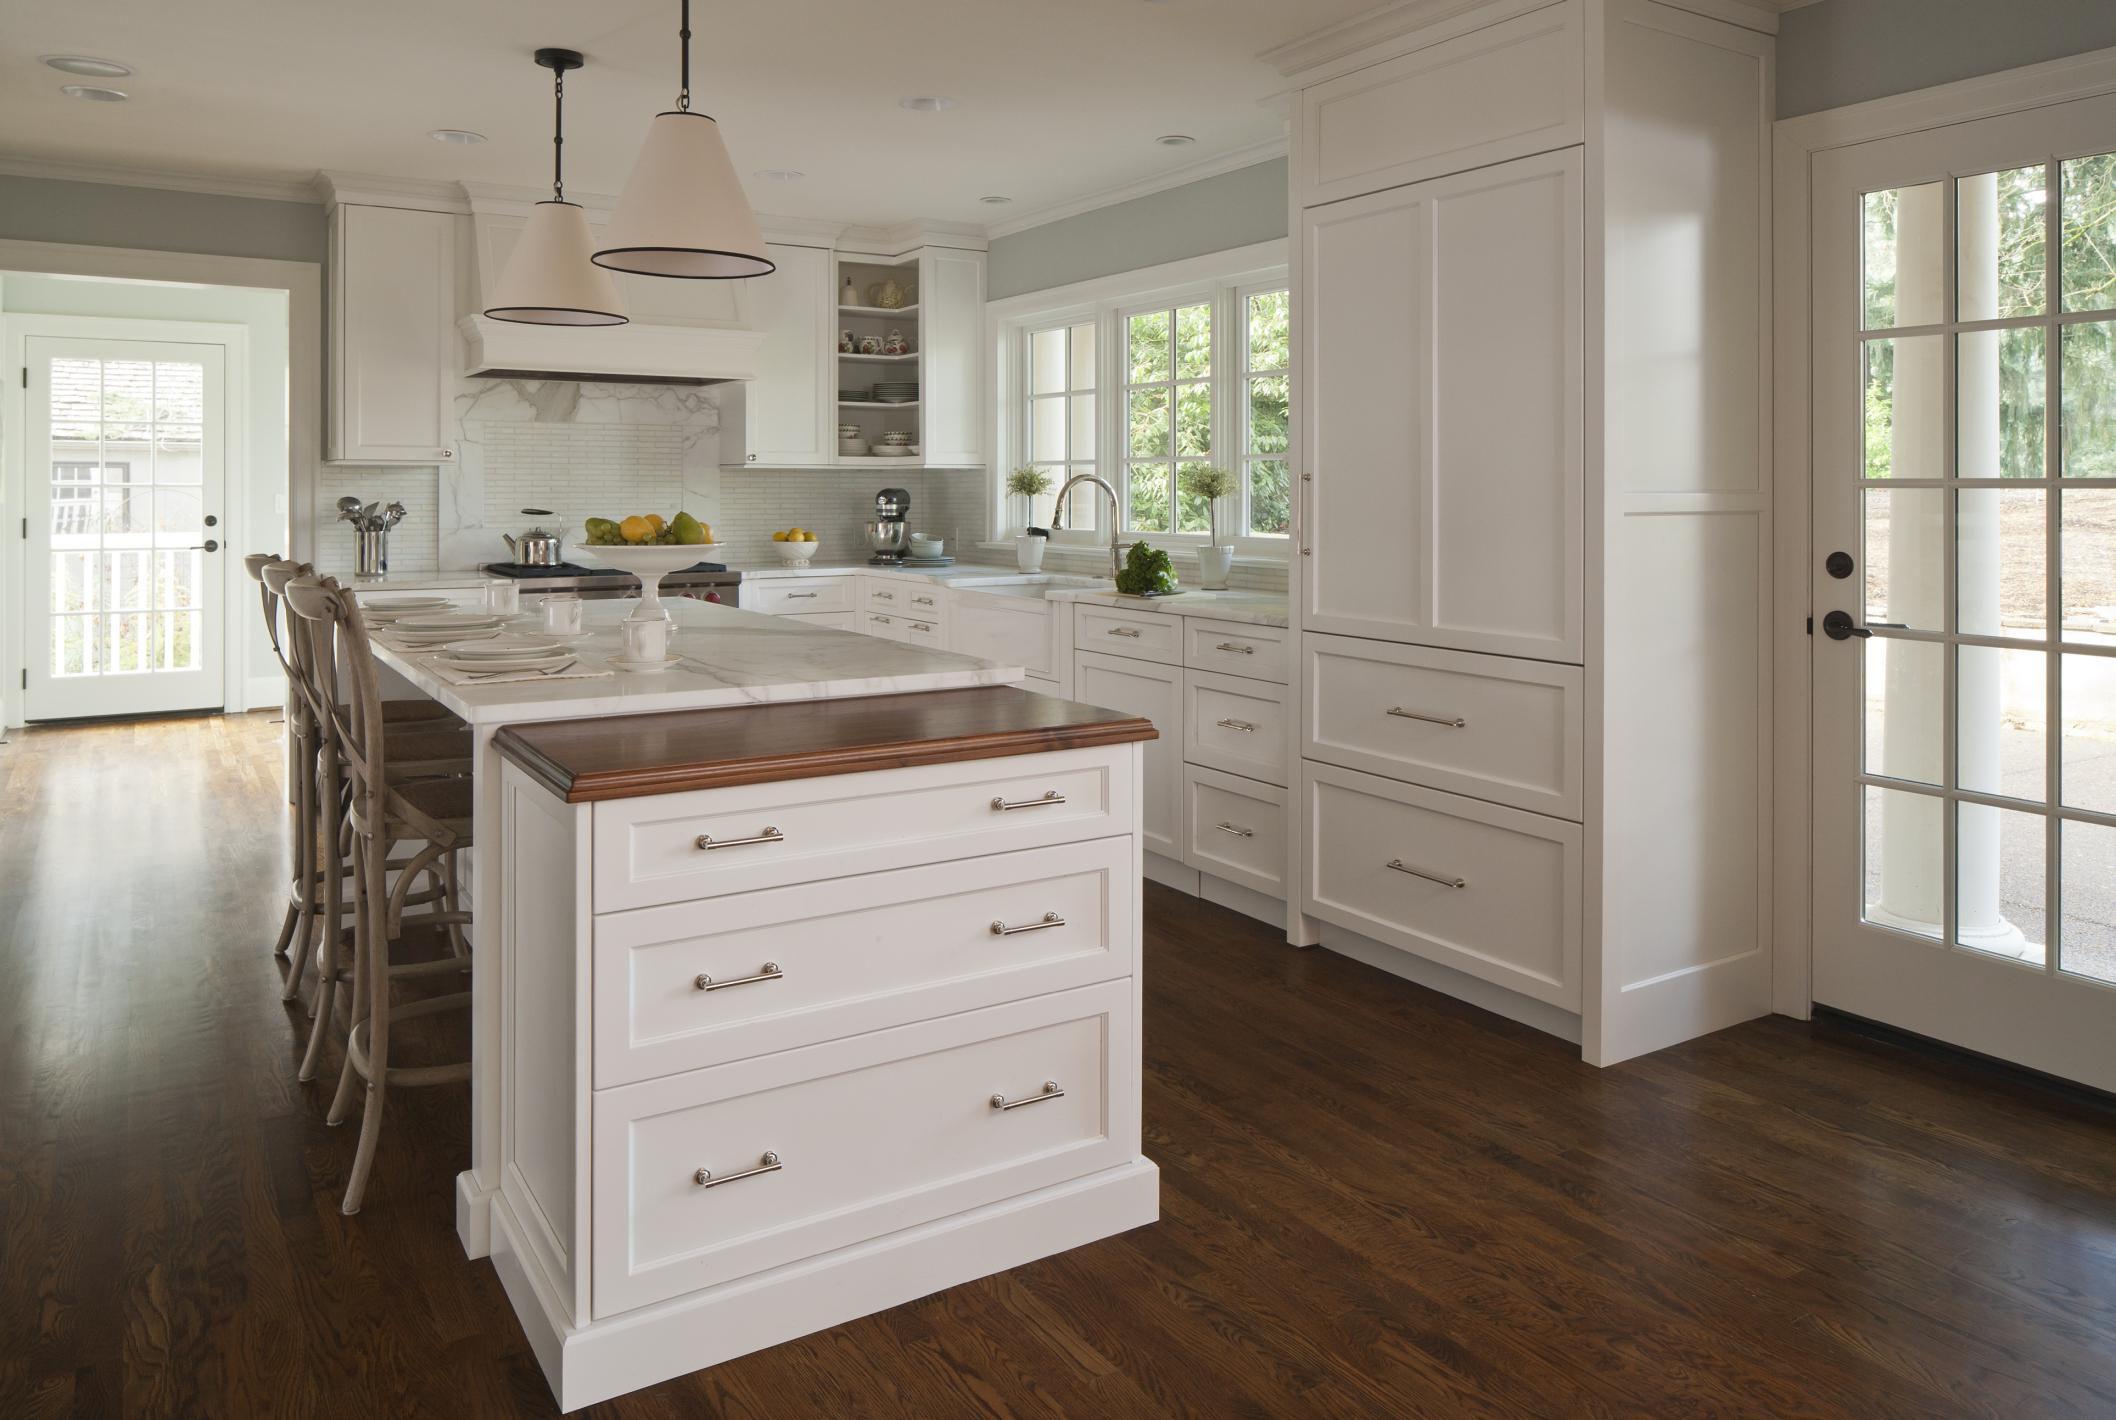 Unique Kitchen Island Ideas